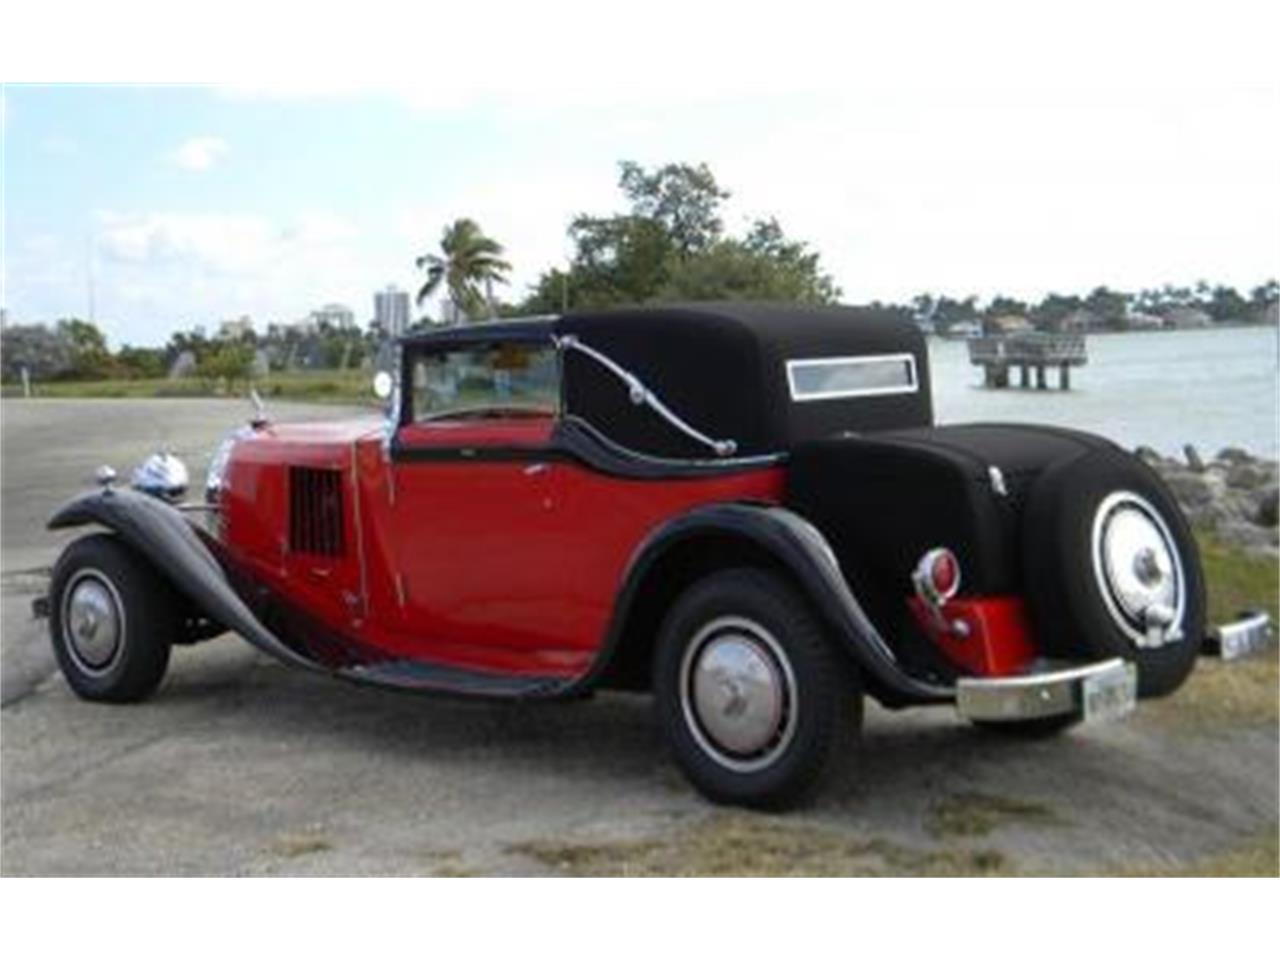 1929 Bugatti Type 41 Royale Binder Sedanca Replica for Sale | ClassicCars.com | CC-427212